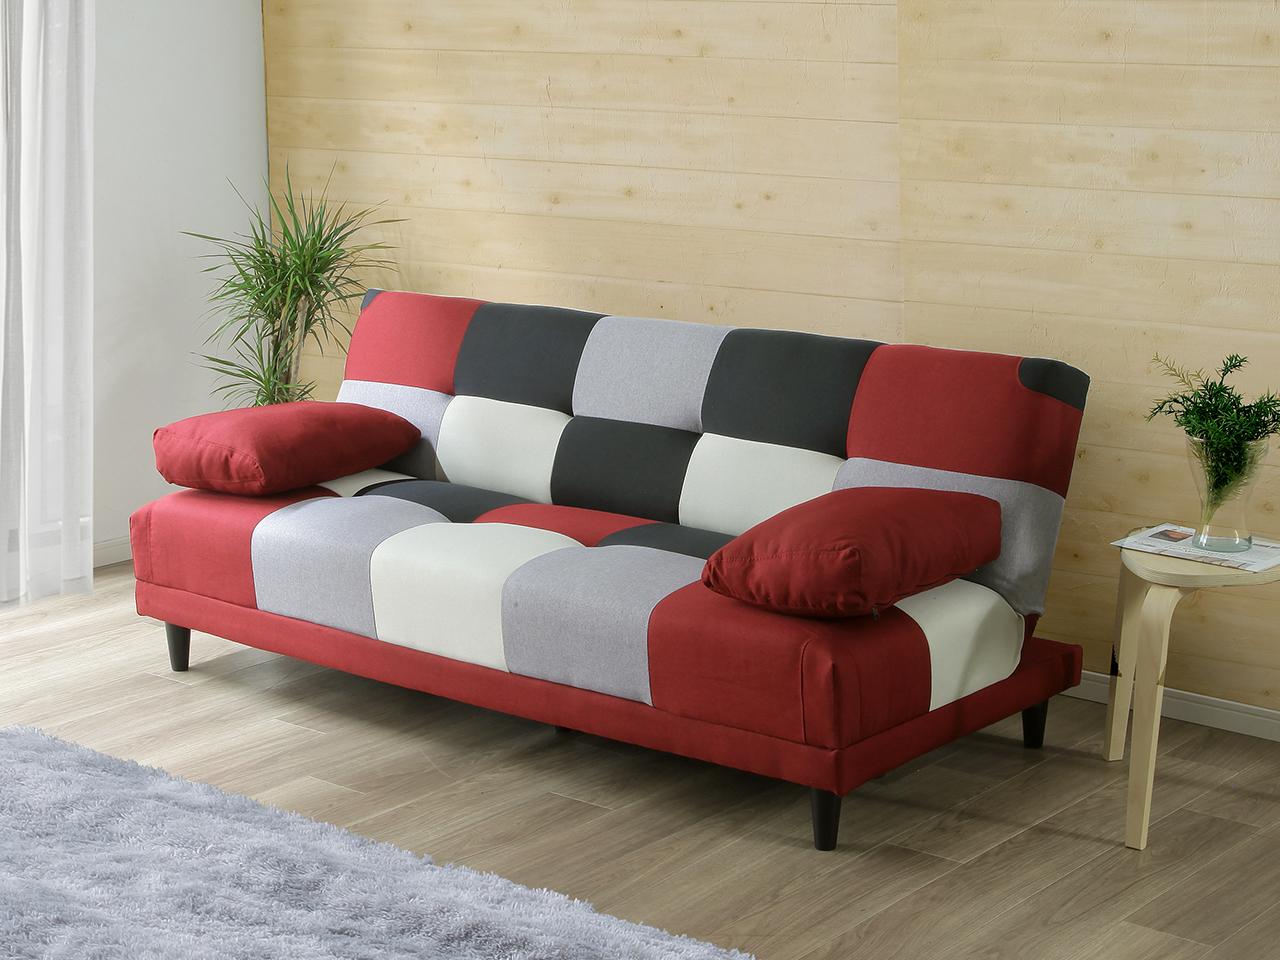 EL330_クッション付き 幅180cm ソファベッド【設置/組立て付き】